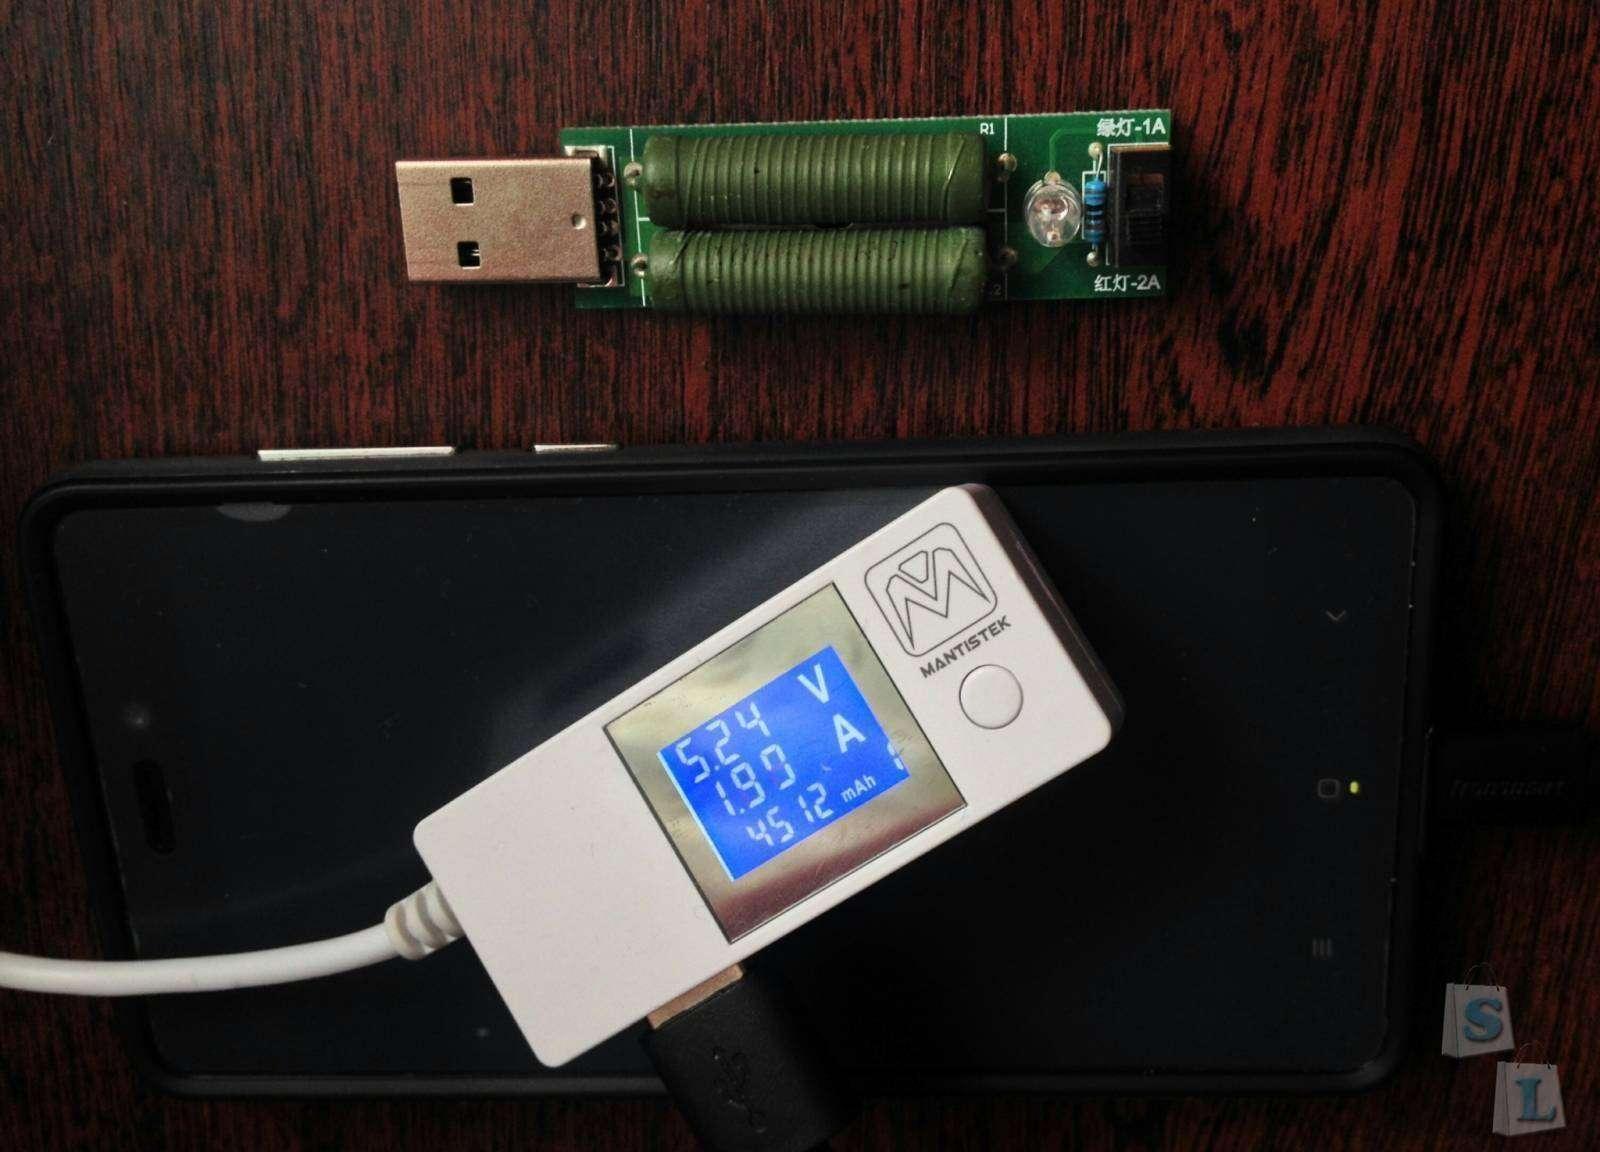 TomTop: Обзор зарядного устройства Dodocool Quick Charge 3.0, и небольшое сравнение с Tronsmart TS-WC3PC